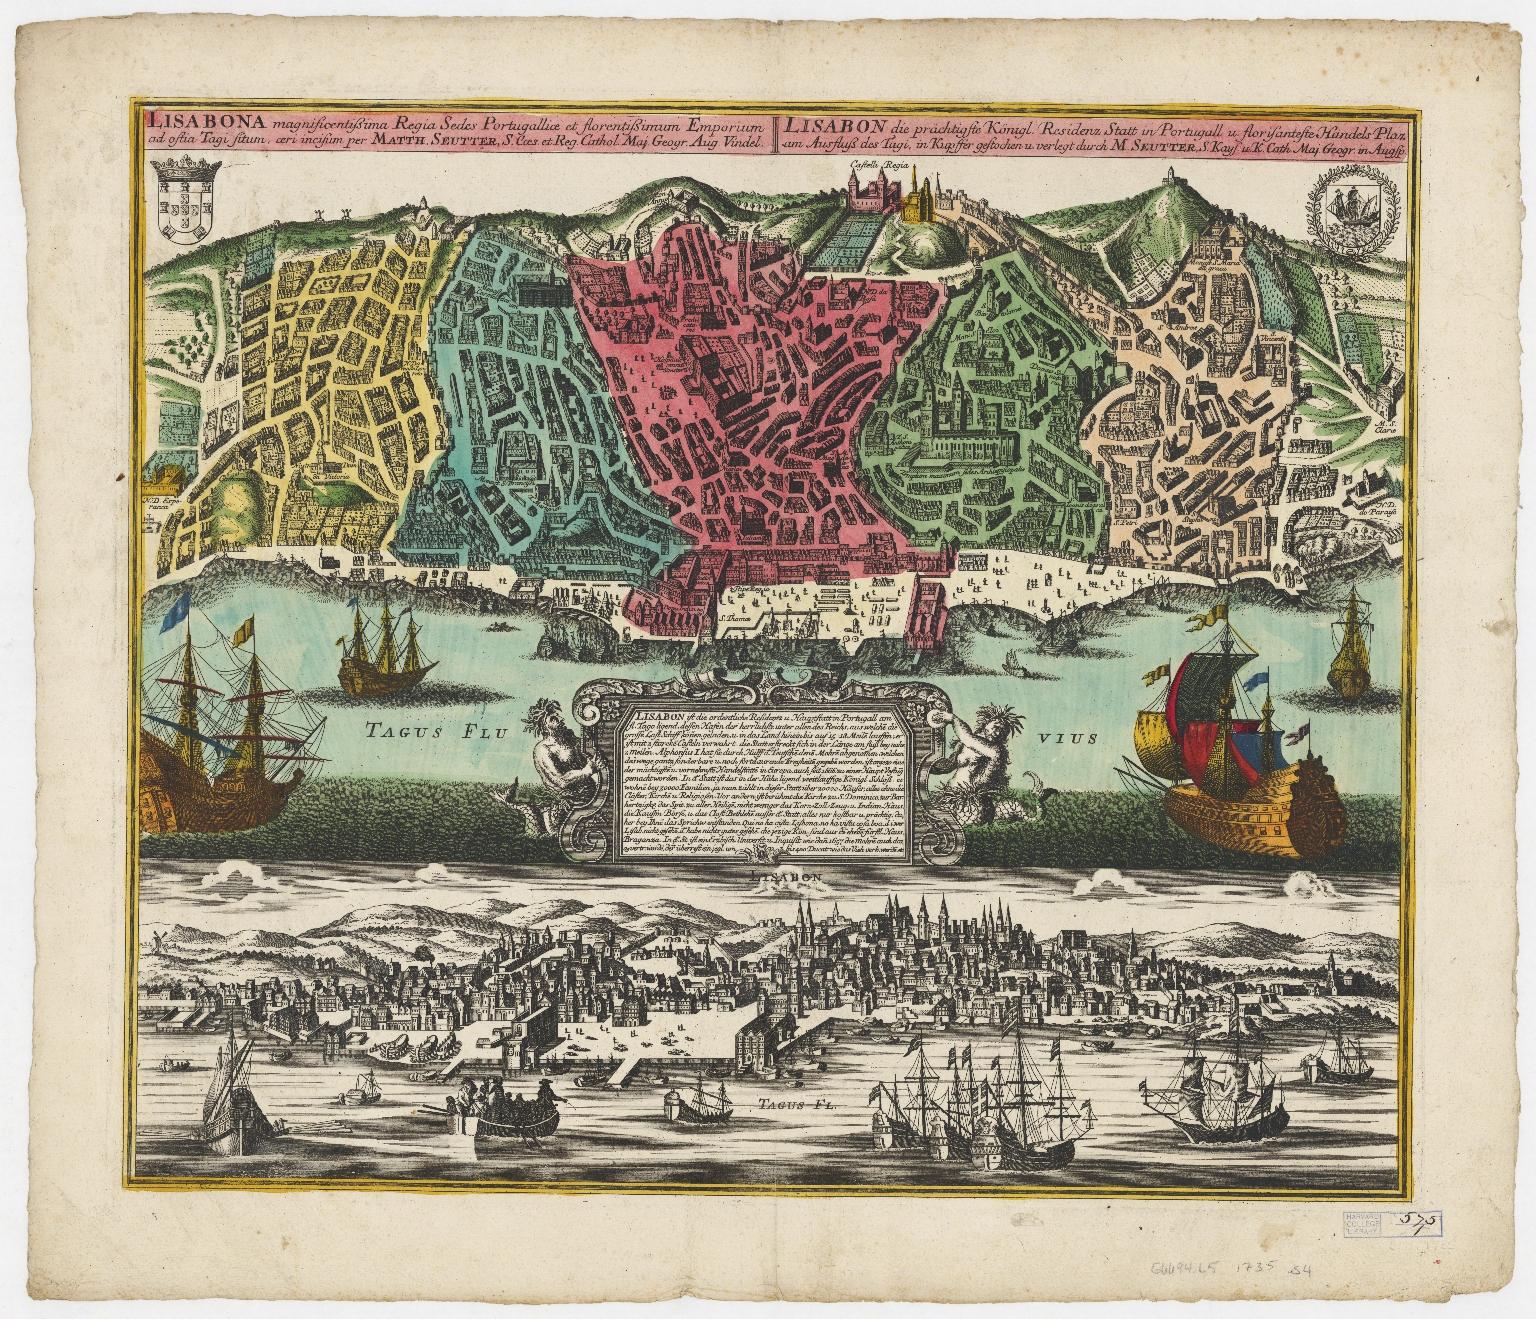 Lisabona magnificentissima Regia sedes Portugalliae et florentissimum Emorium ad oftia tagi situm = Lisabon die prächtigste Königl. Residenz Statt in Portugall u. florisanteste Handels Plaz am Austfluß des Tagi